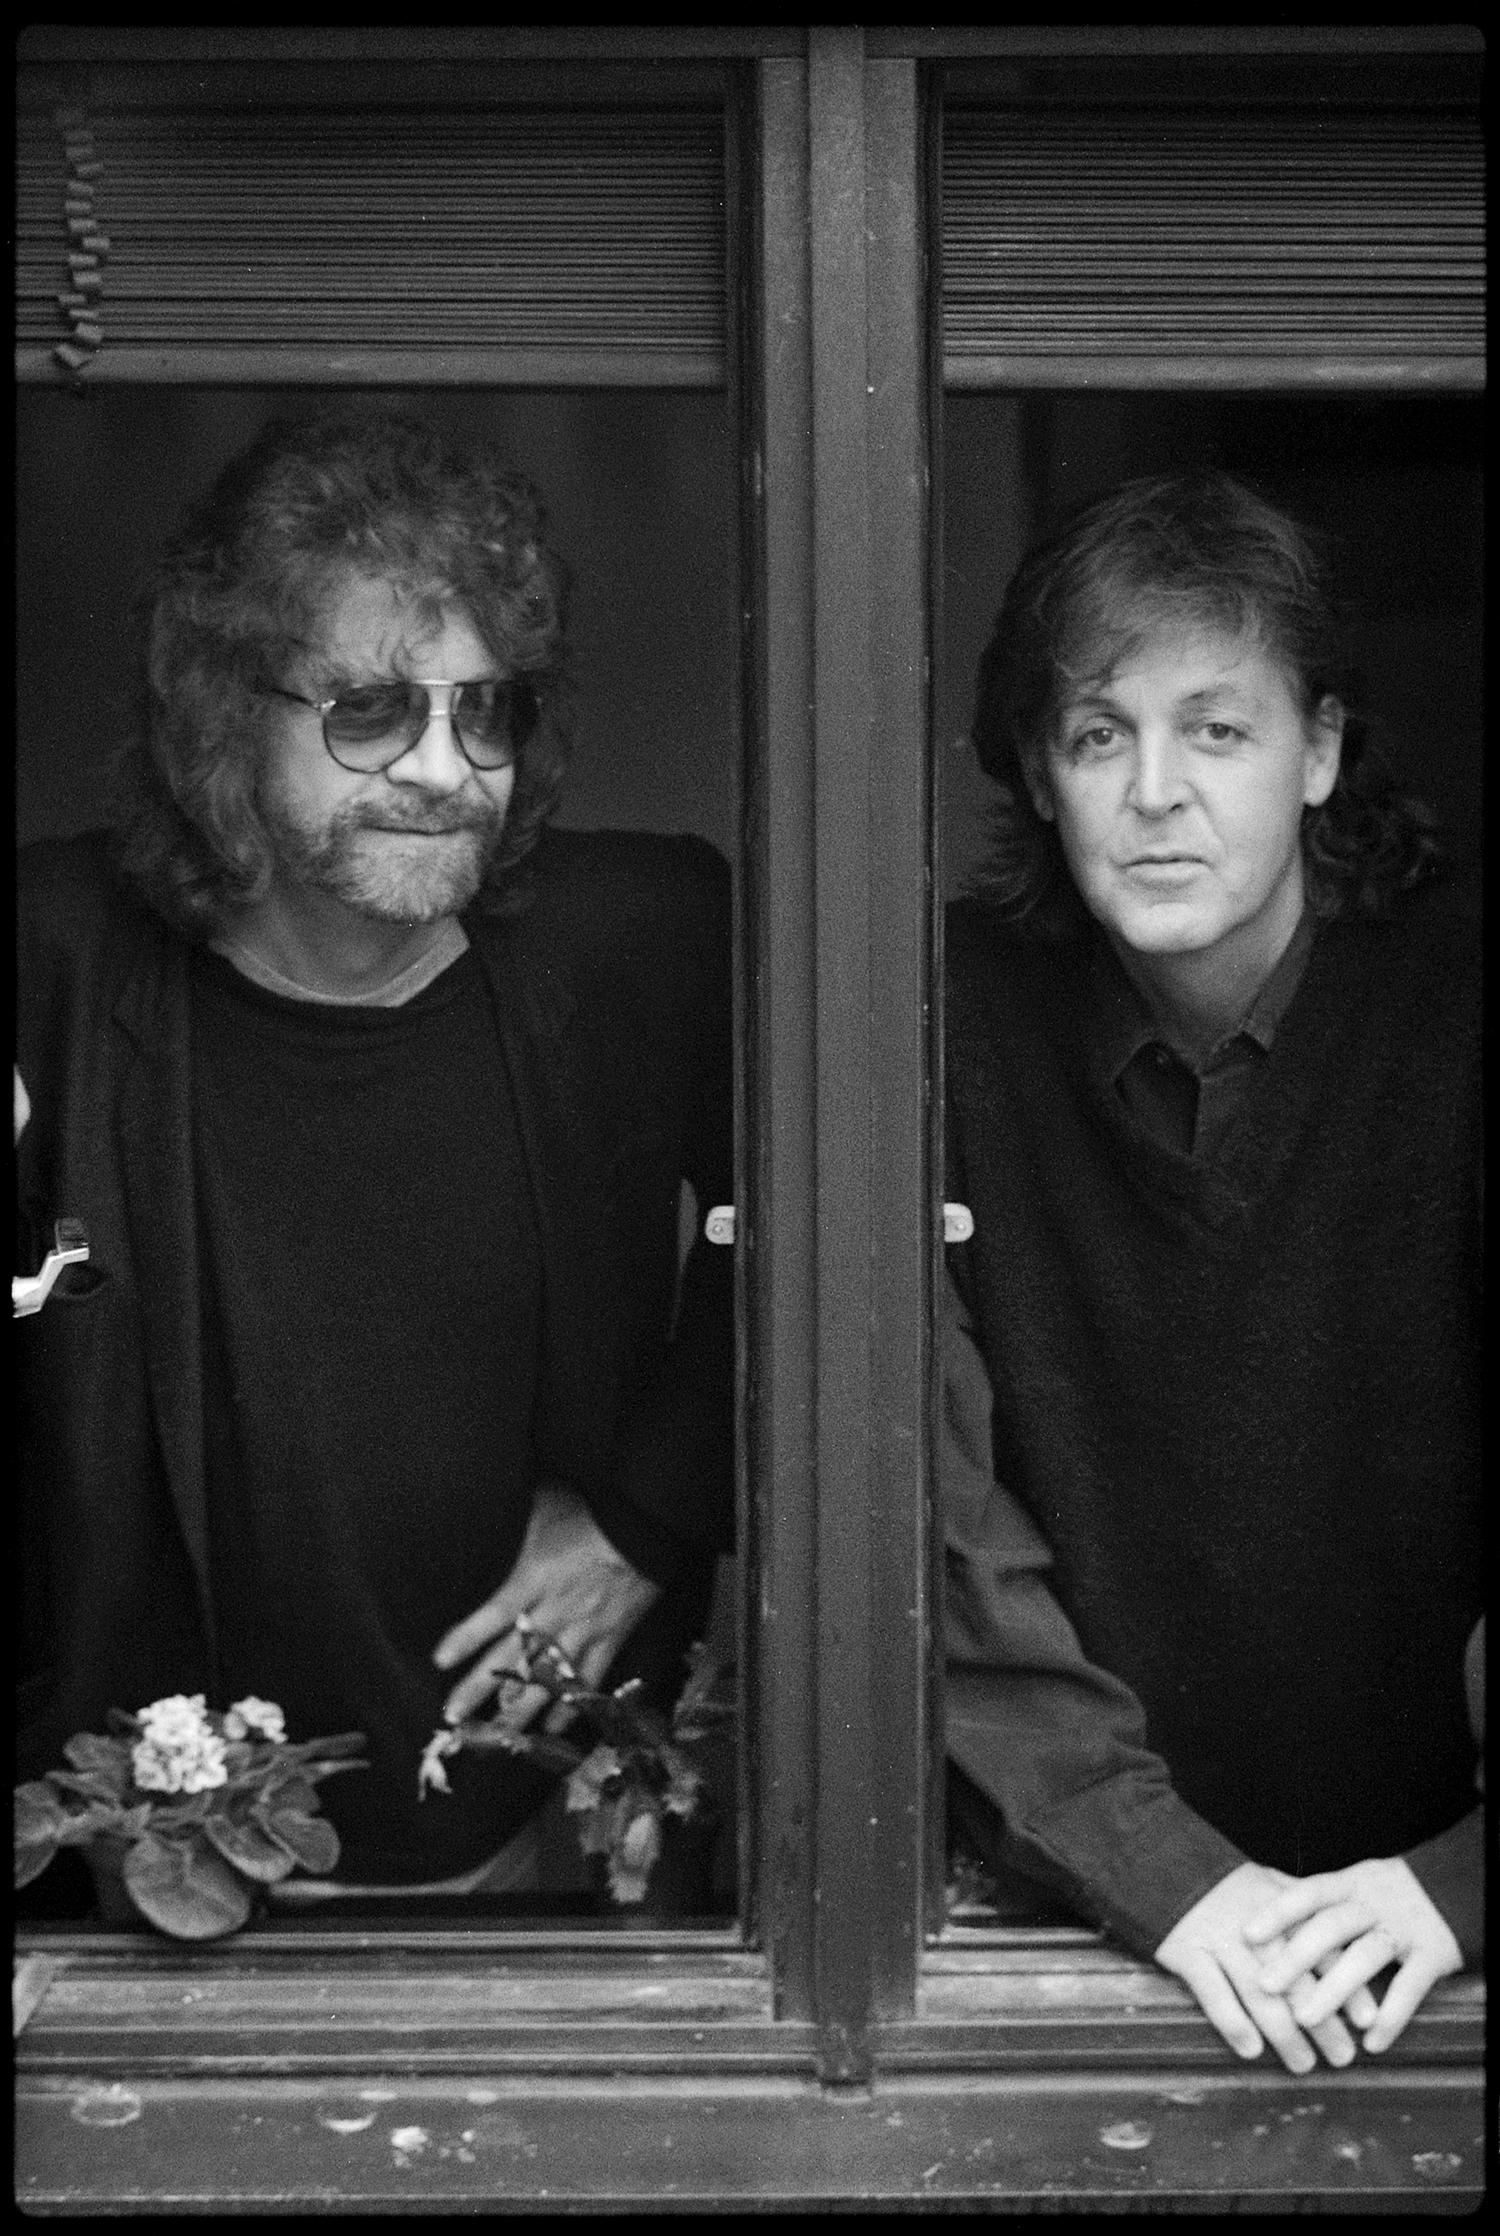 Jeff Lynne and Paul McCartney by Linda McCartney